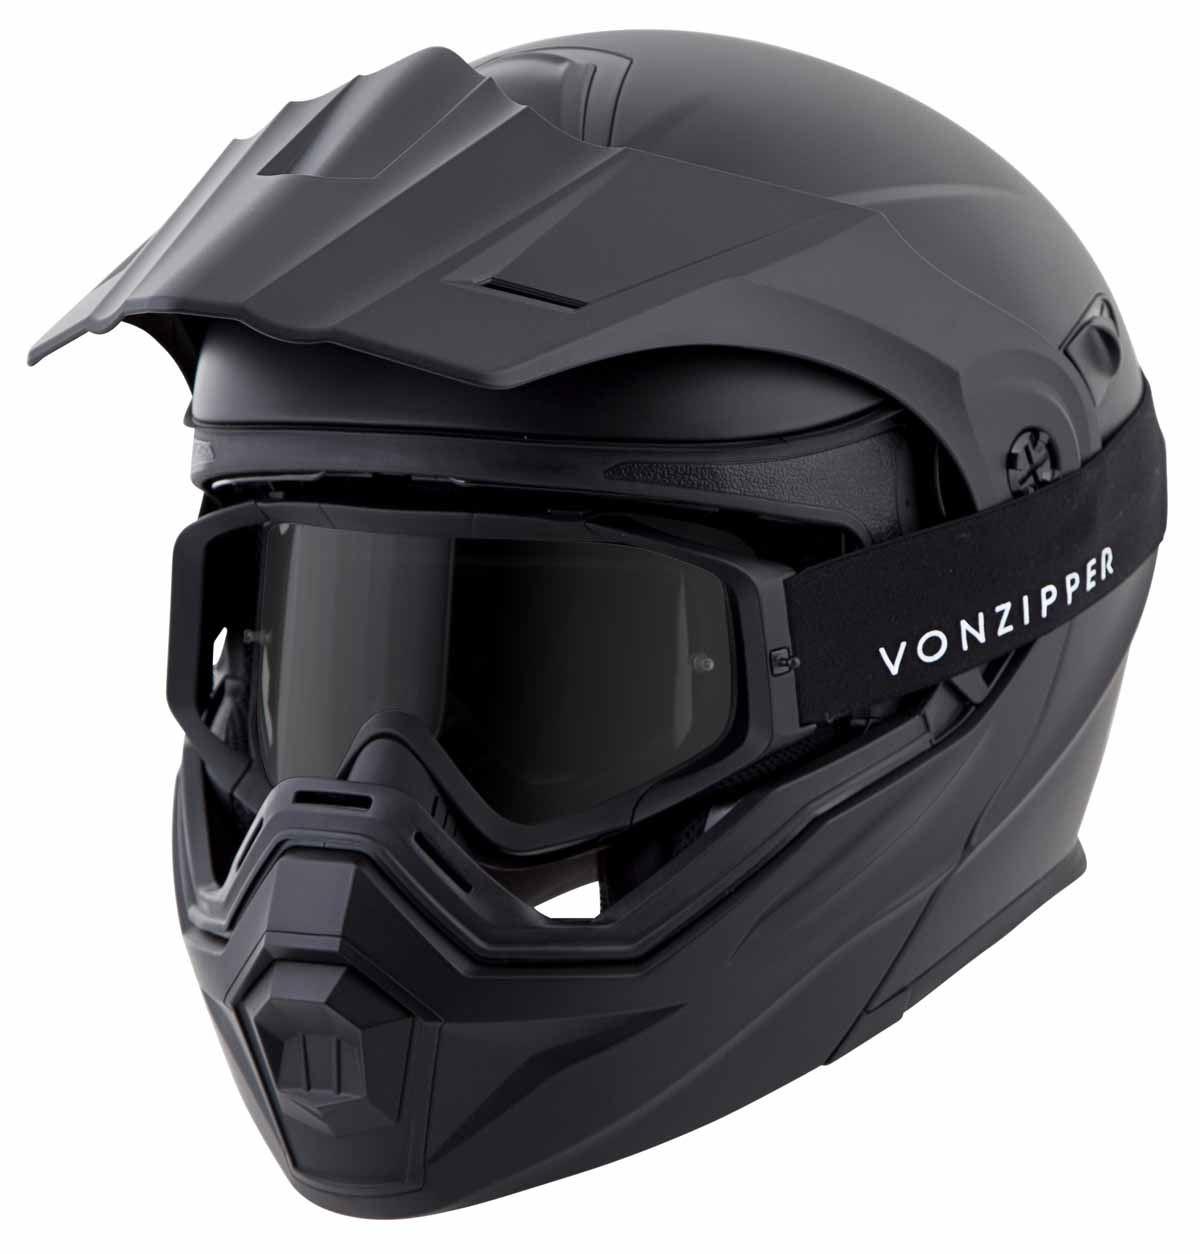 Scorpion-EXO-AT950-Helmet-Flip-Up-Modular-Dual-Sport-Adventure-ADV-DOT-XS-3XL miniature 7